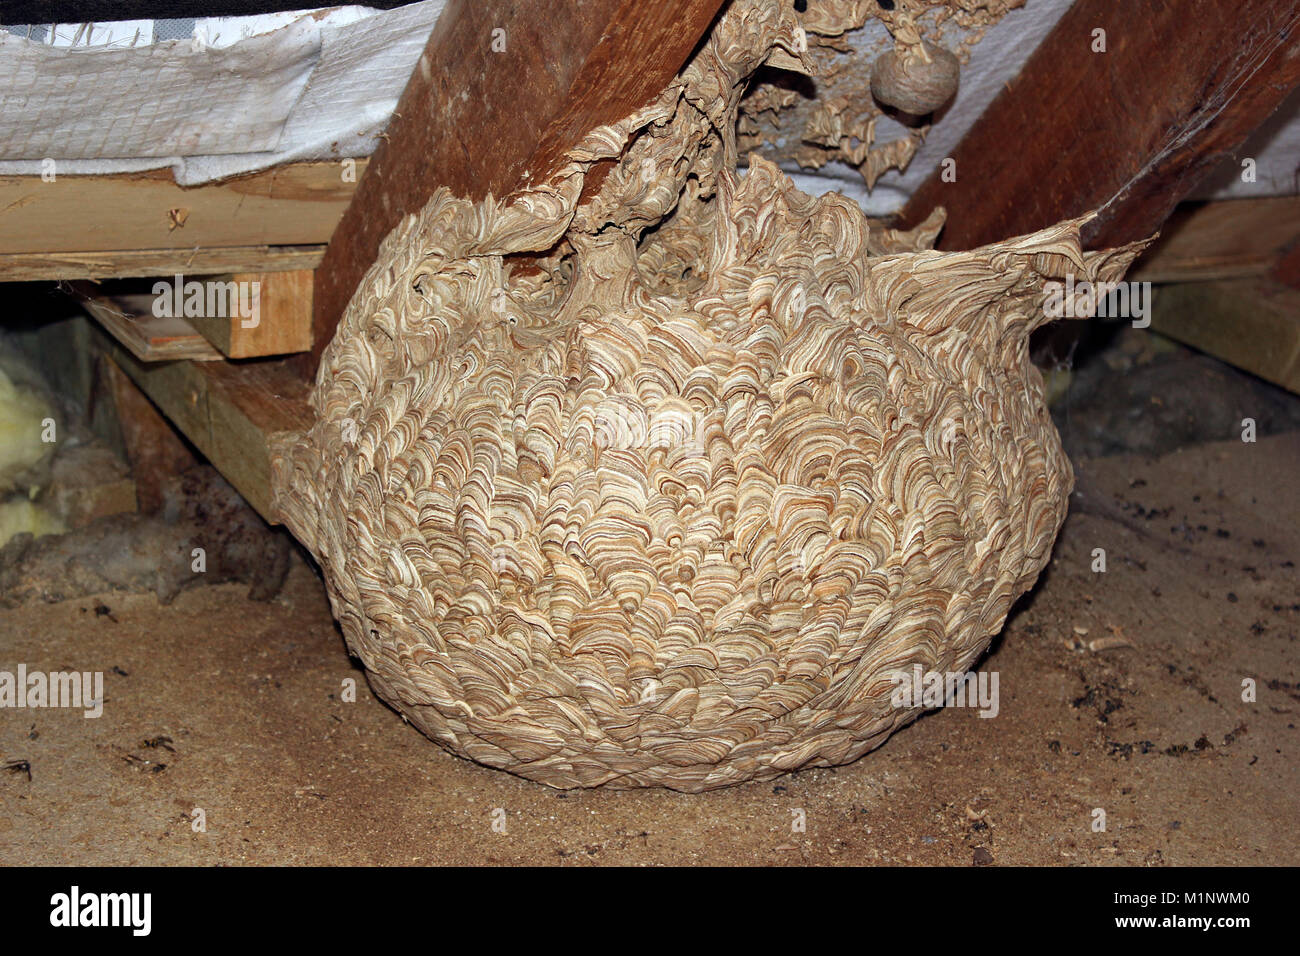 Wespen nest attached Sparren im Dachboden zu Haus